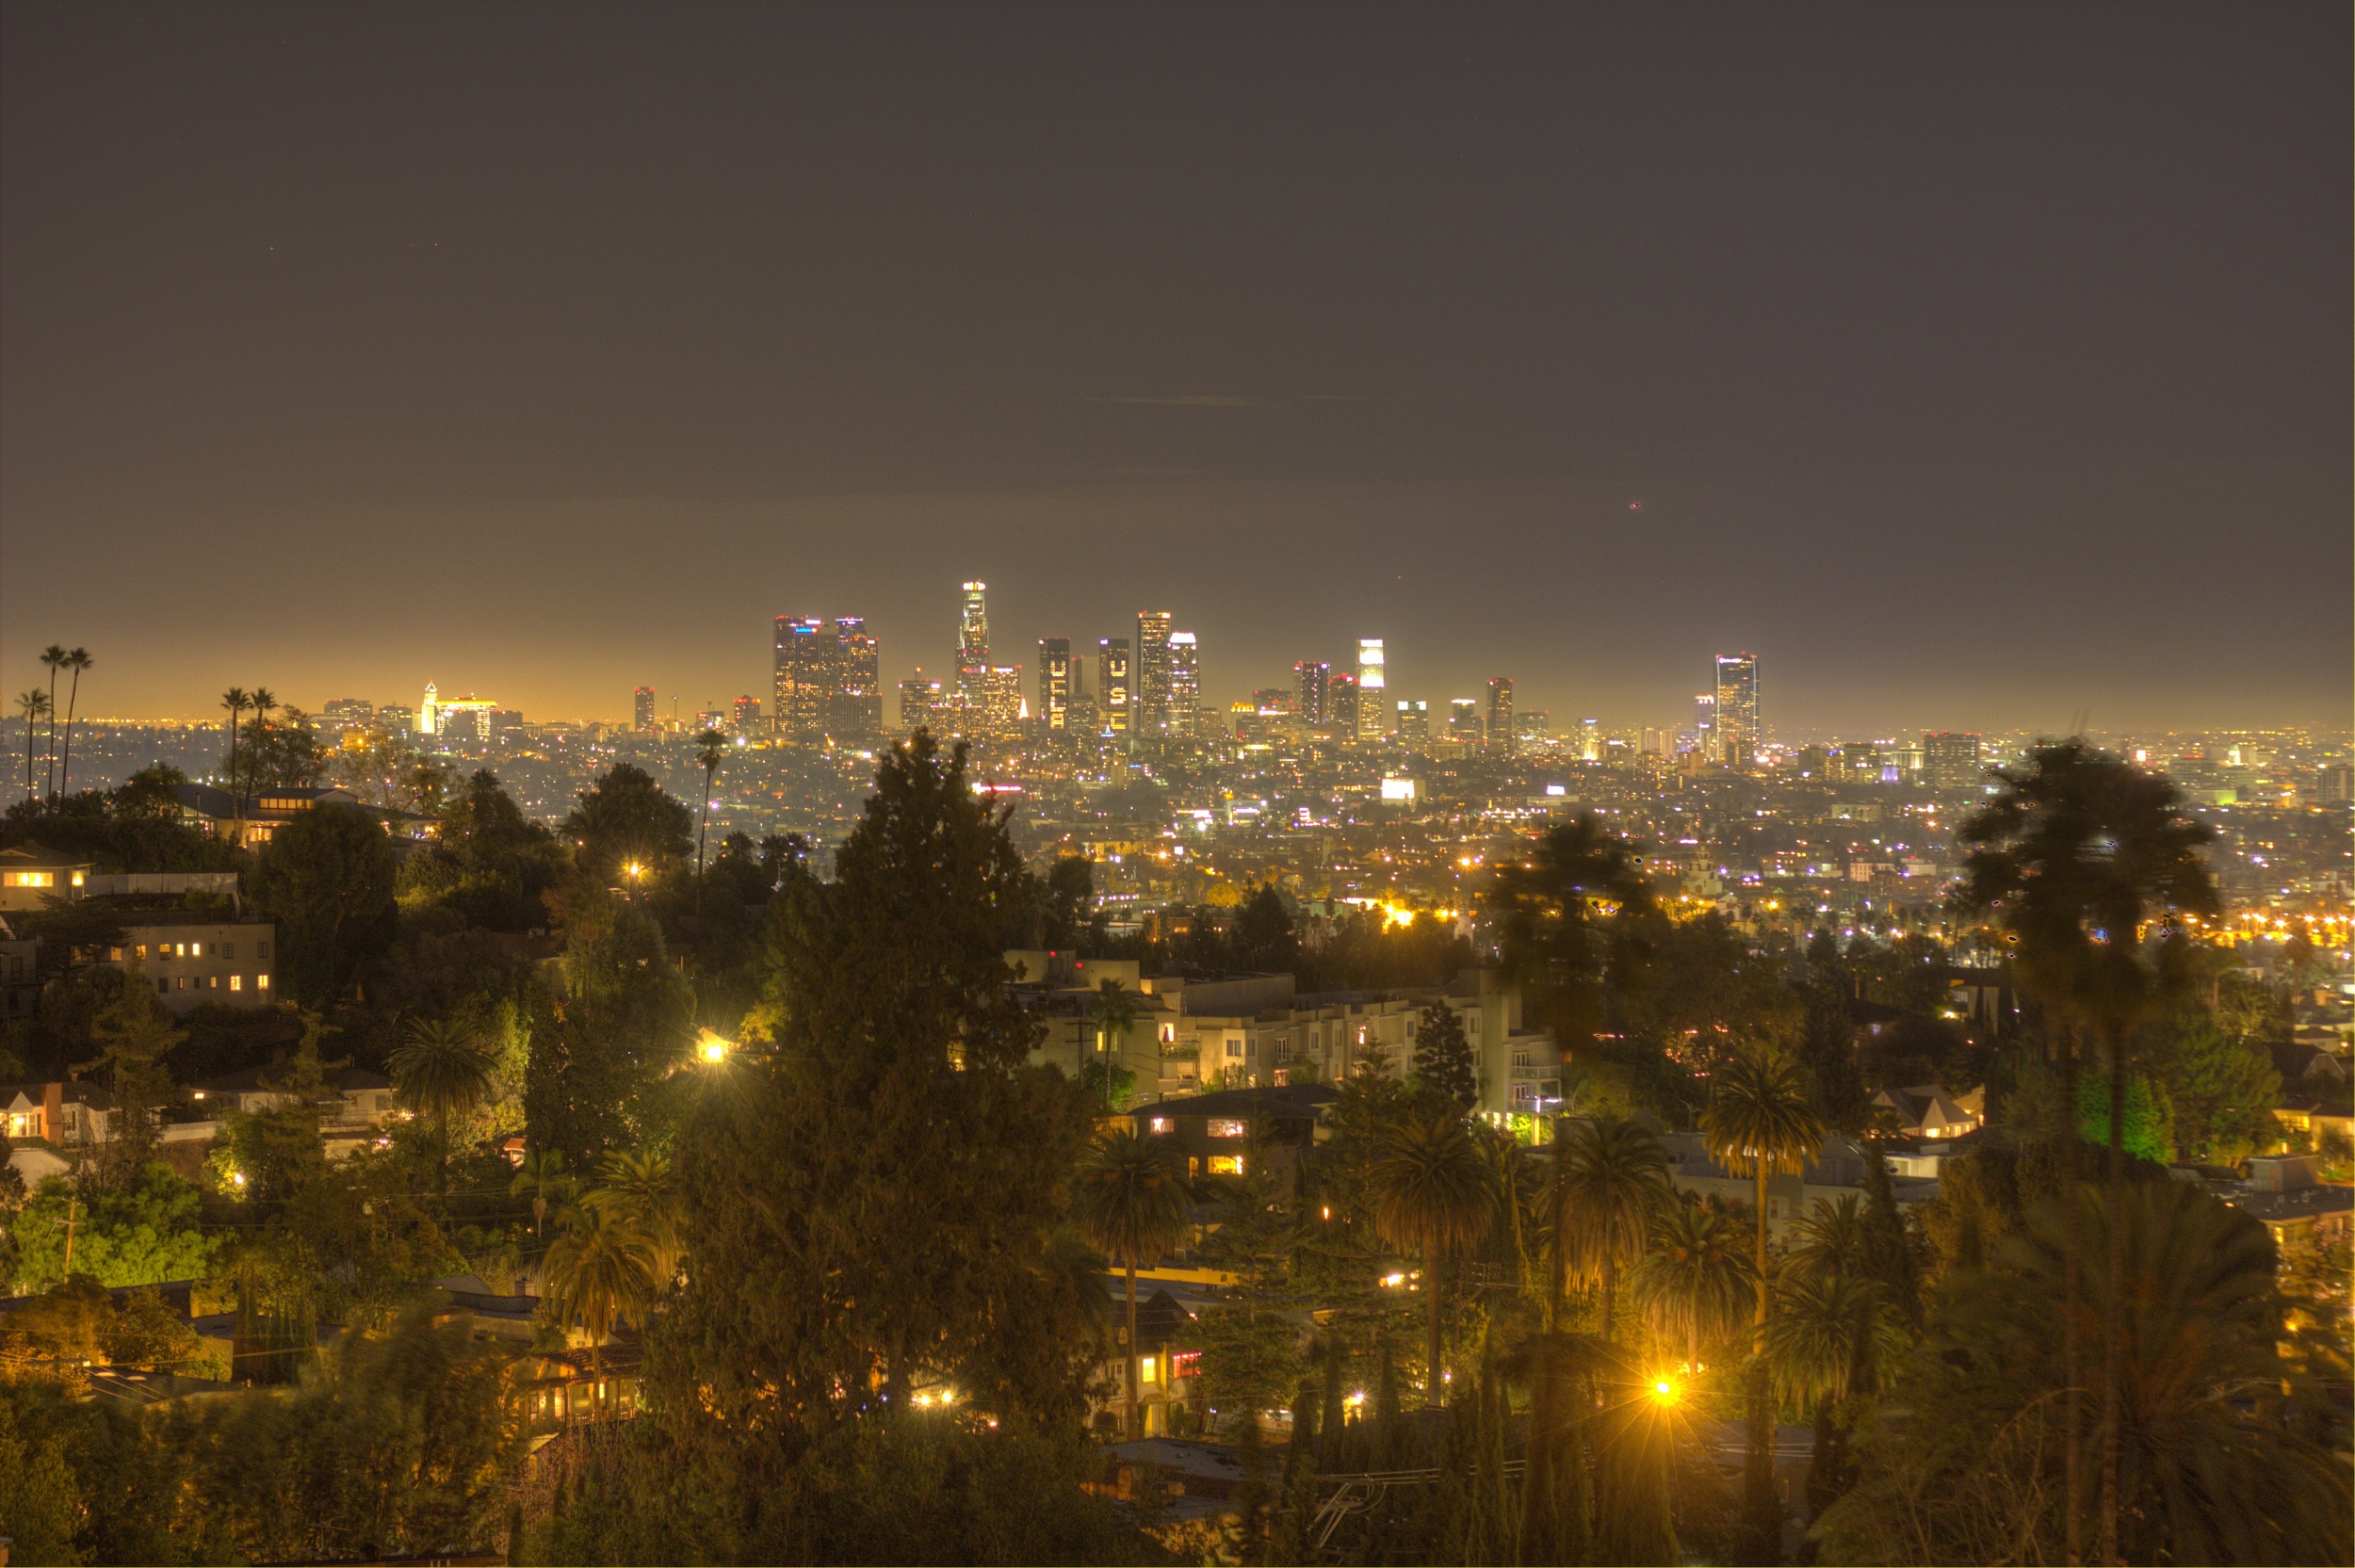 Hills to Downtown HDR_2 JPEG.jpg